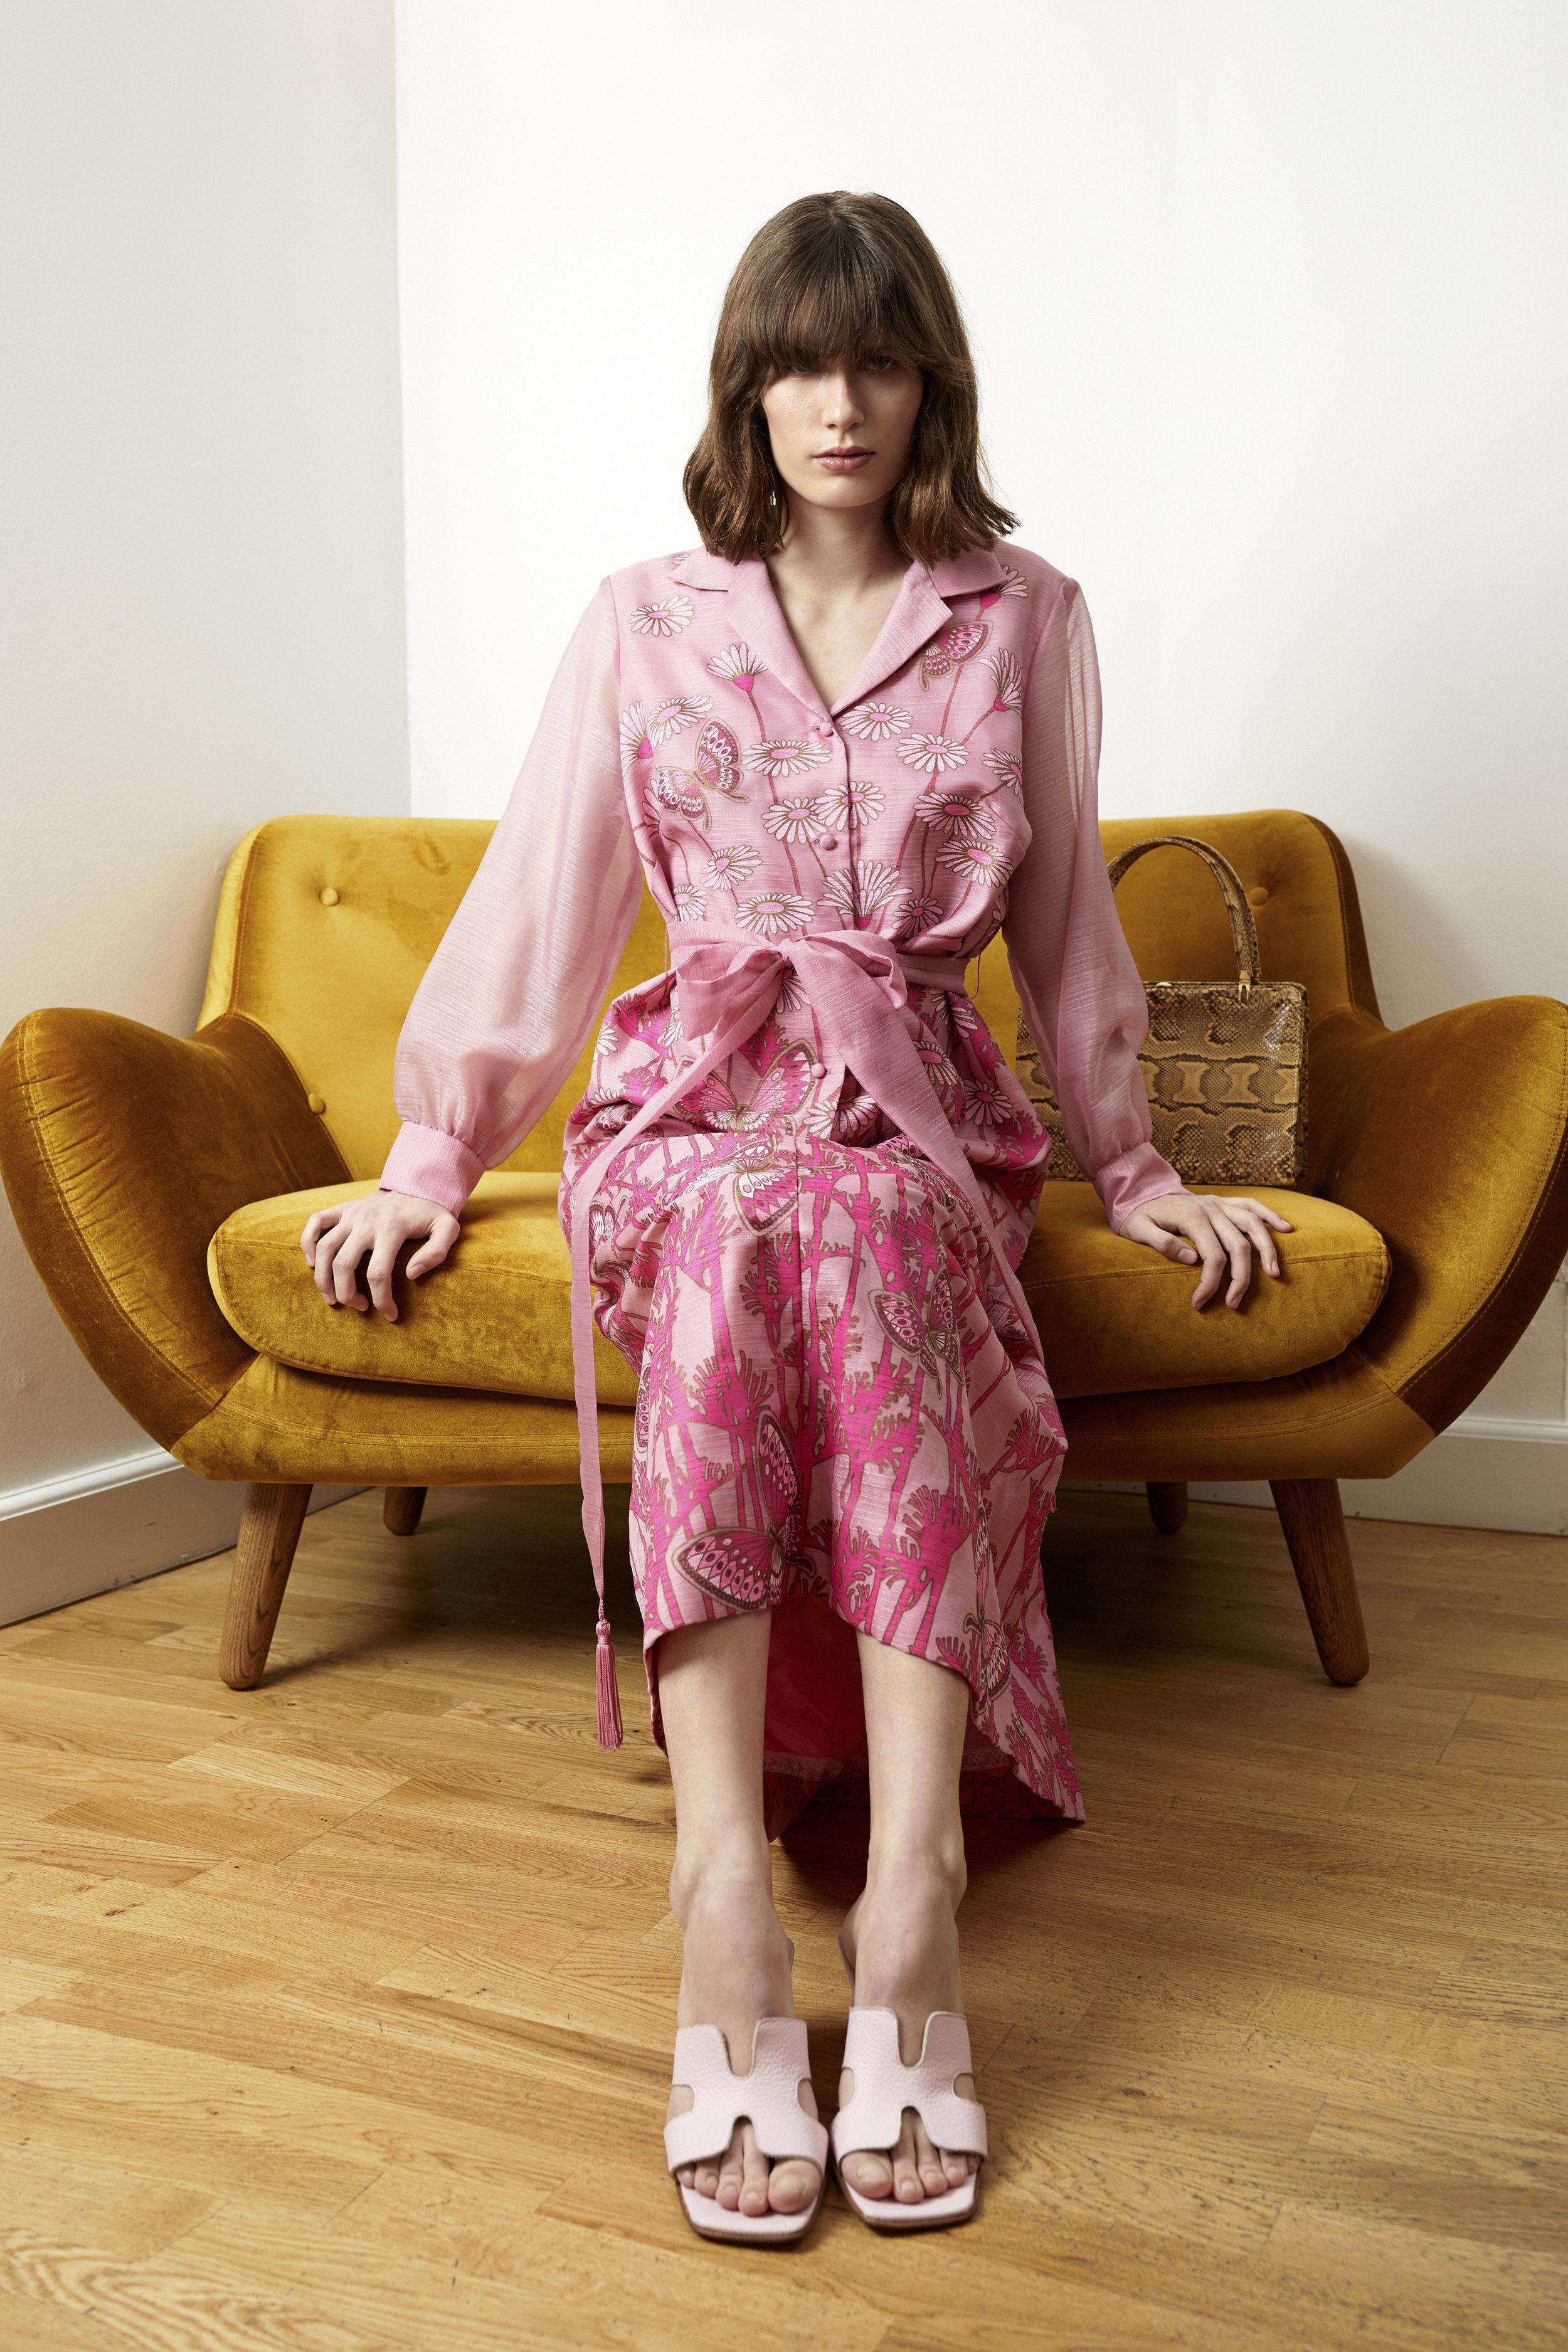 Vintage 1970's Shazeen Dress - Available now